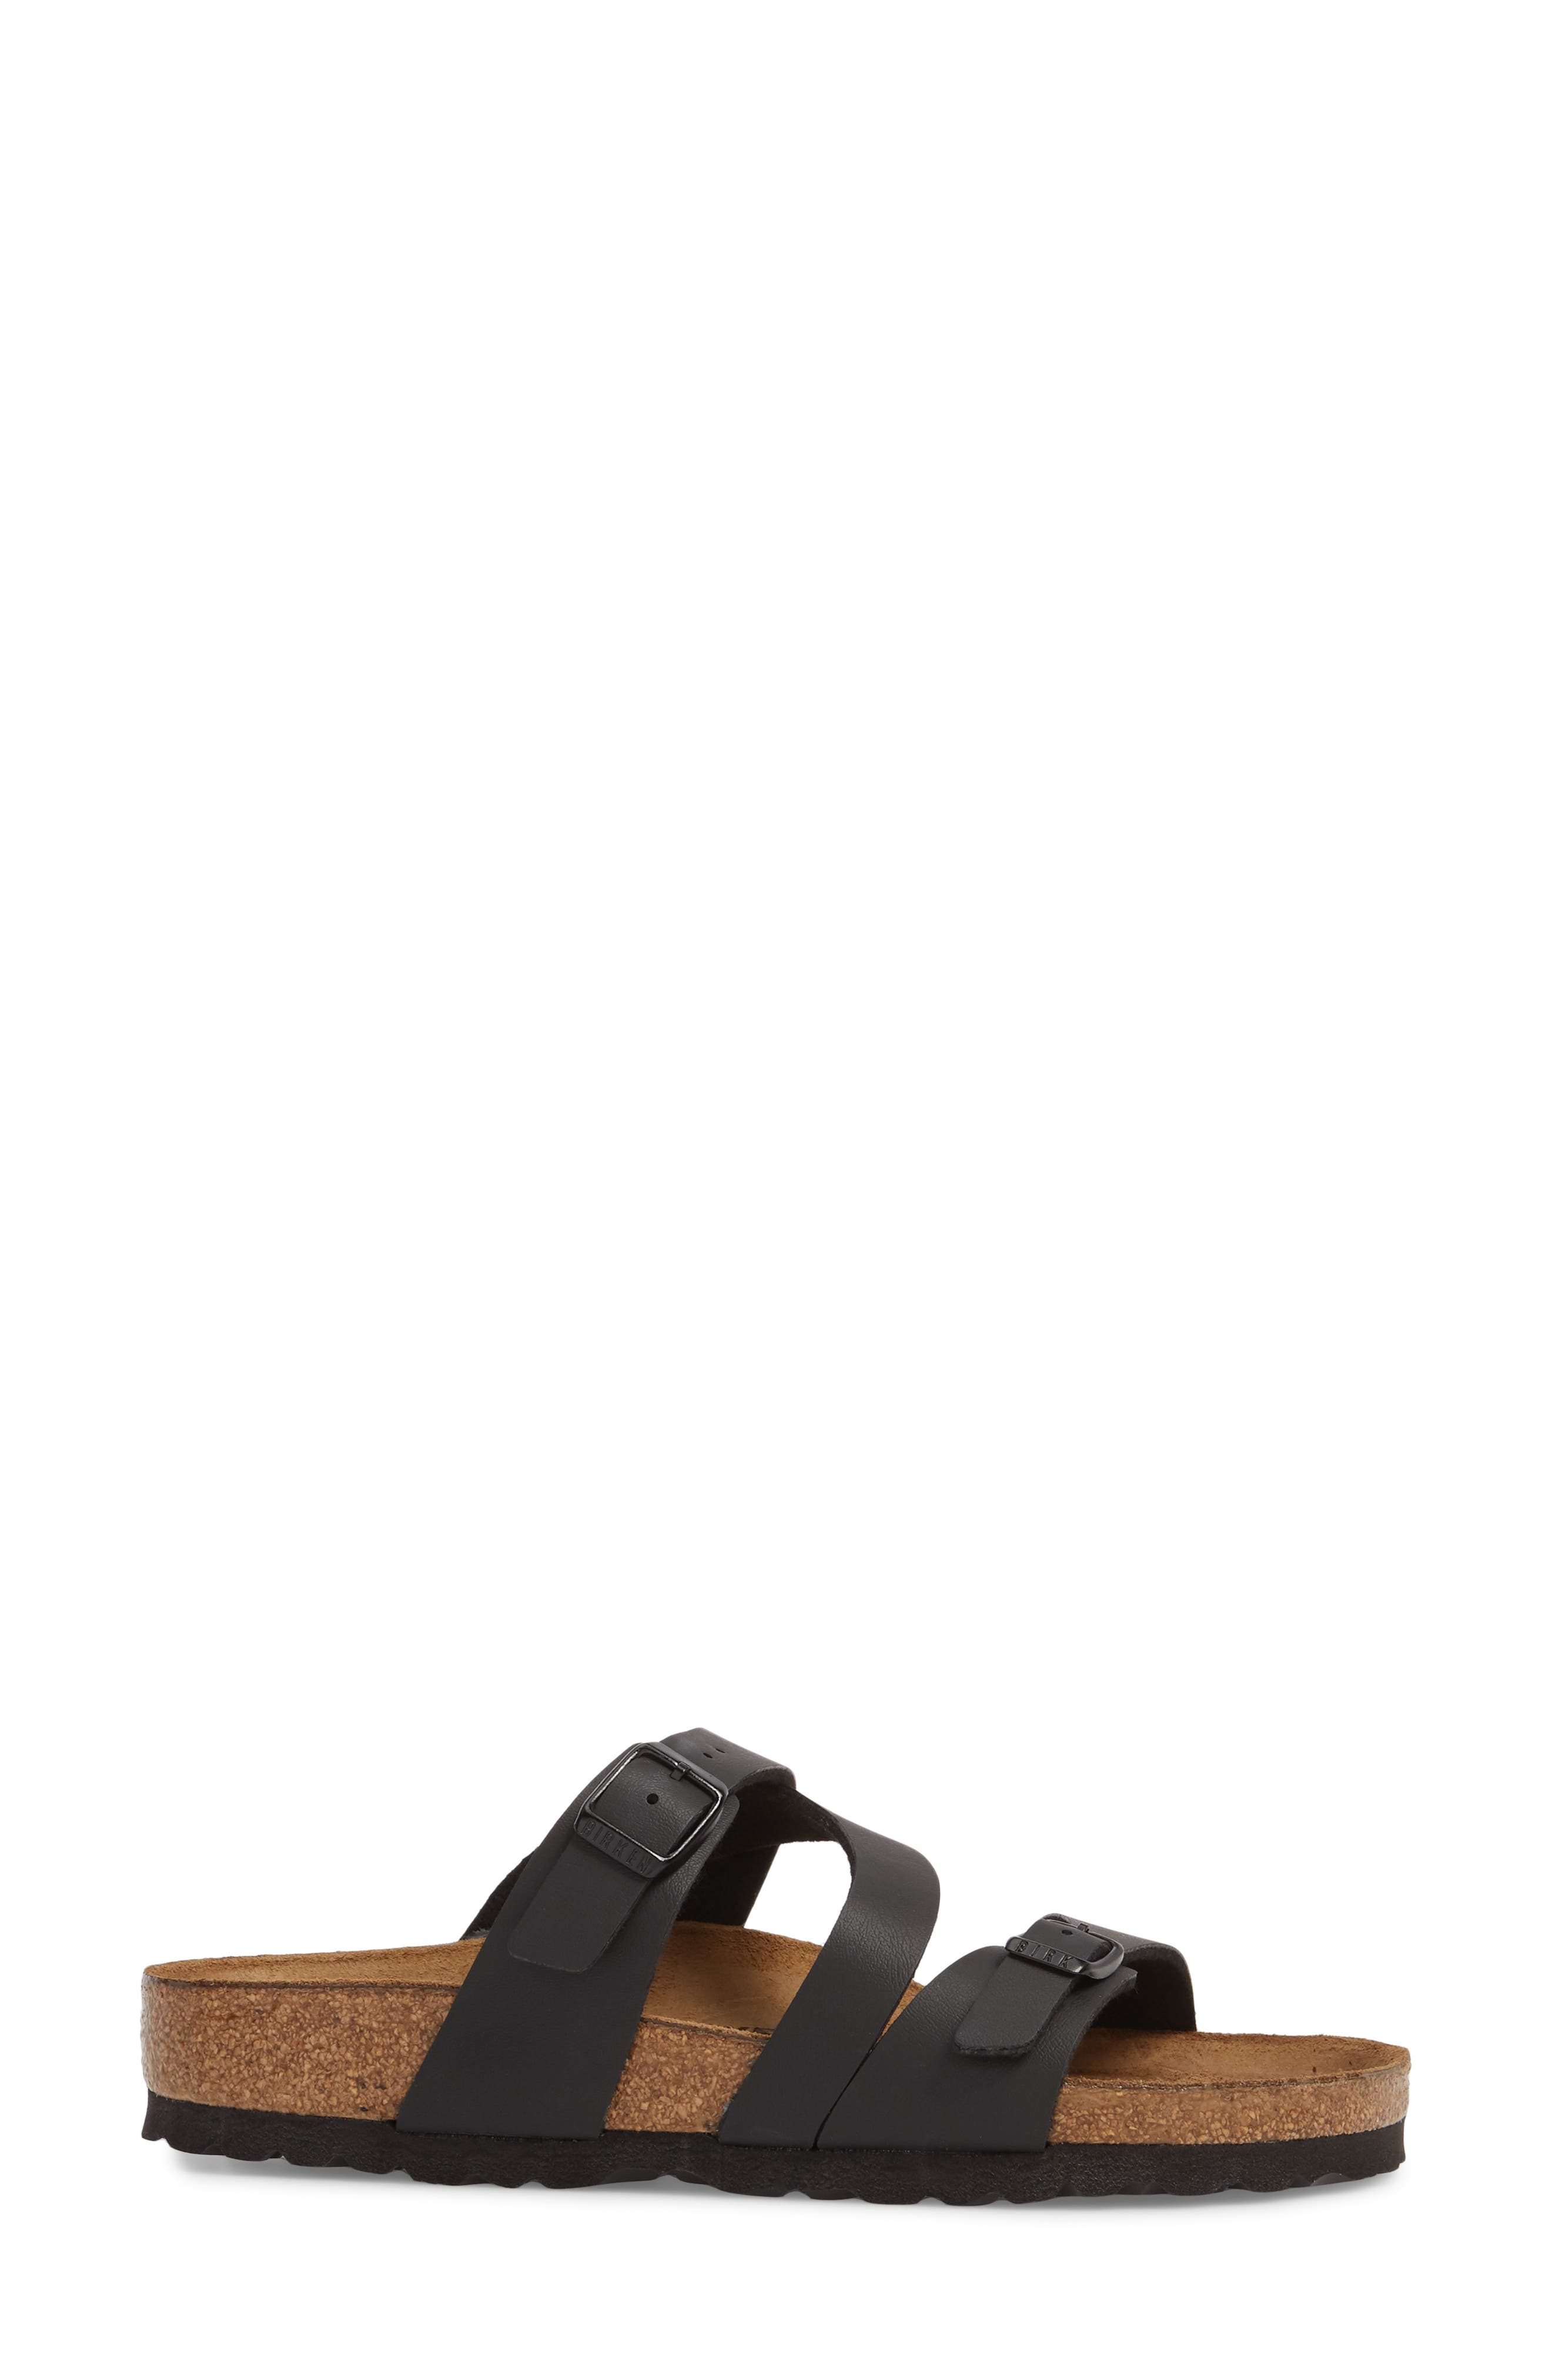 Salina Slide Sandal,                             Alternate thumbnail 3, color,                             Black